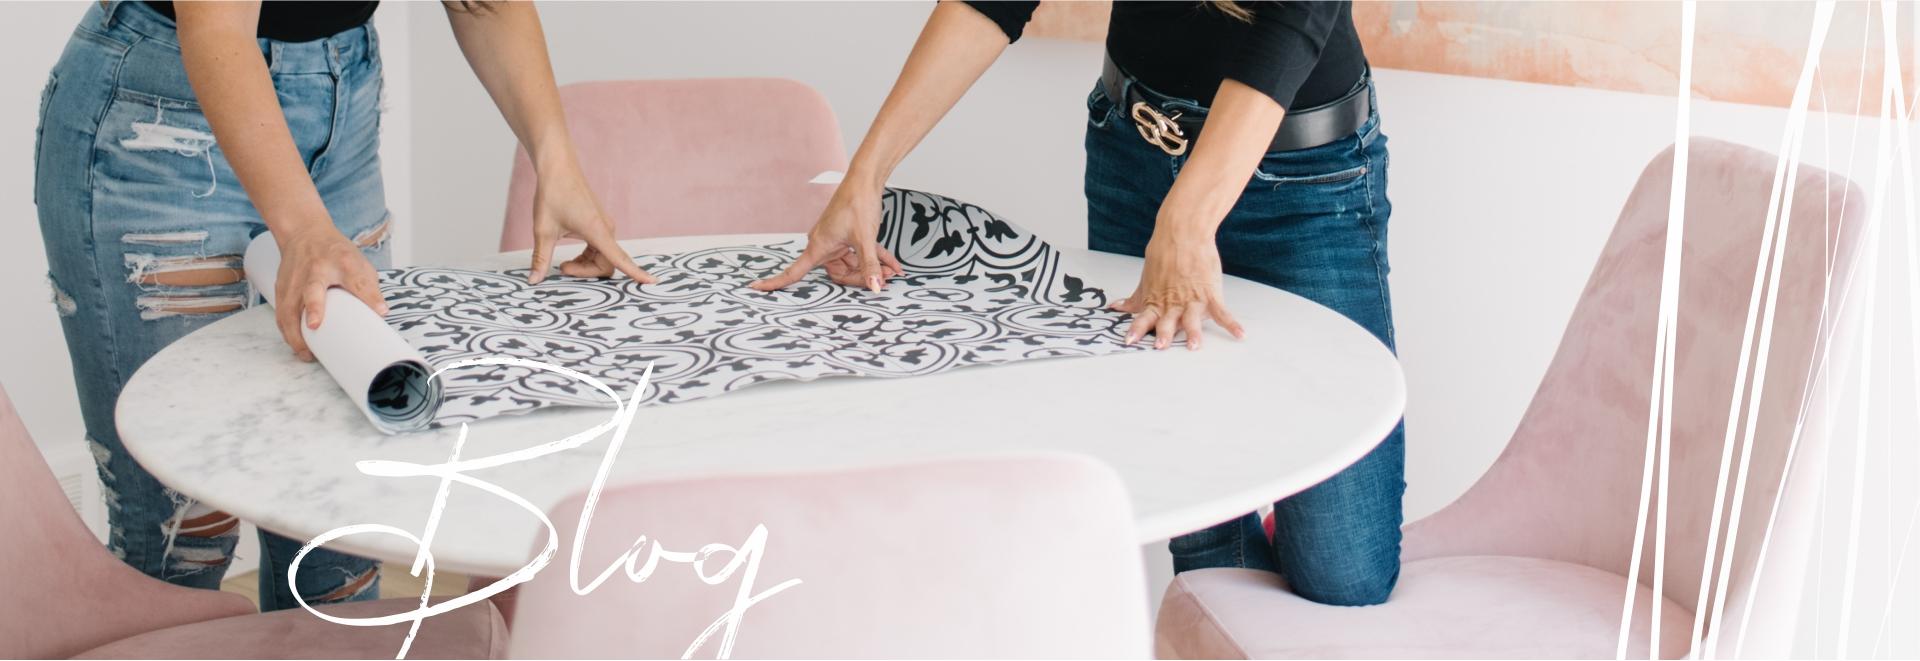 Hello Sticky - Wallpaper The World - Header